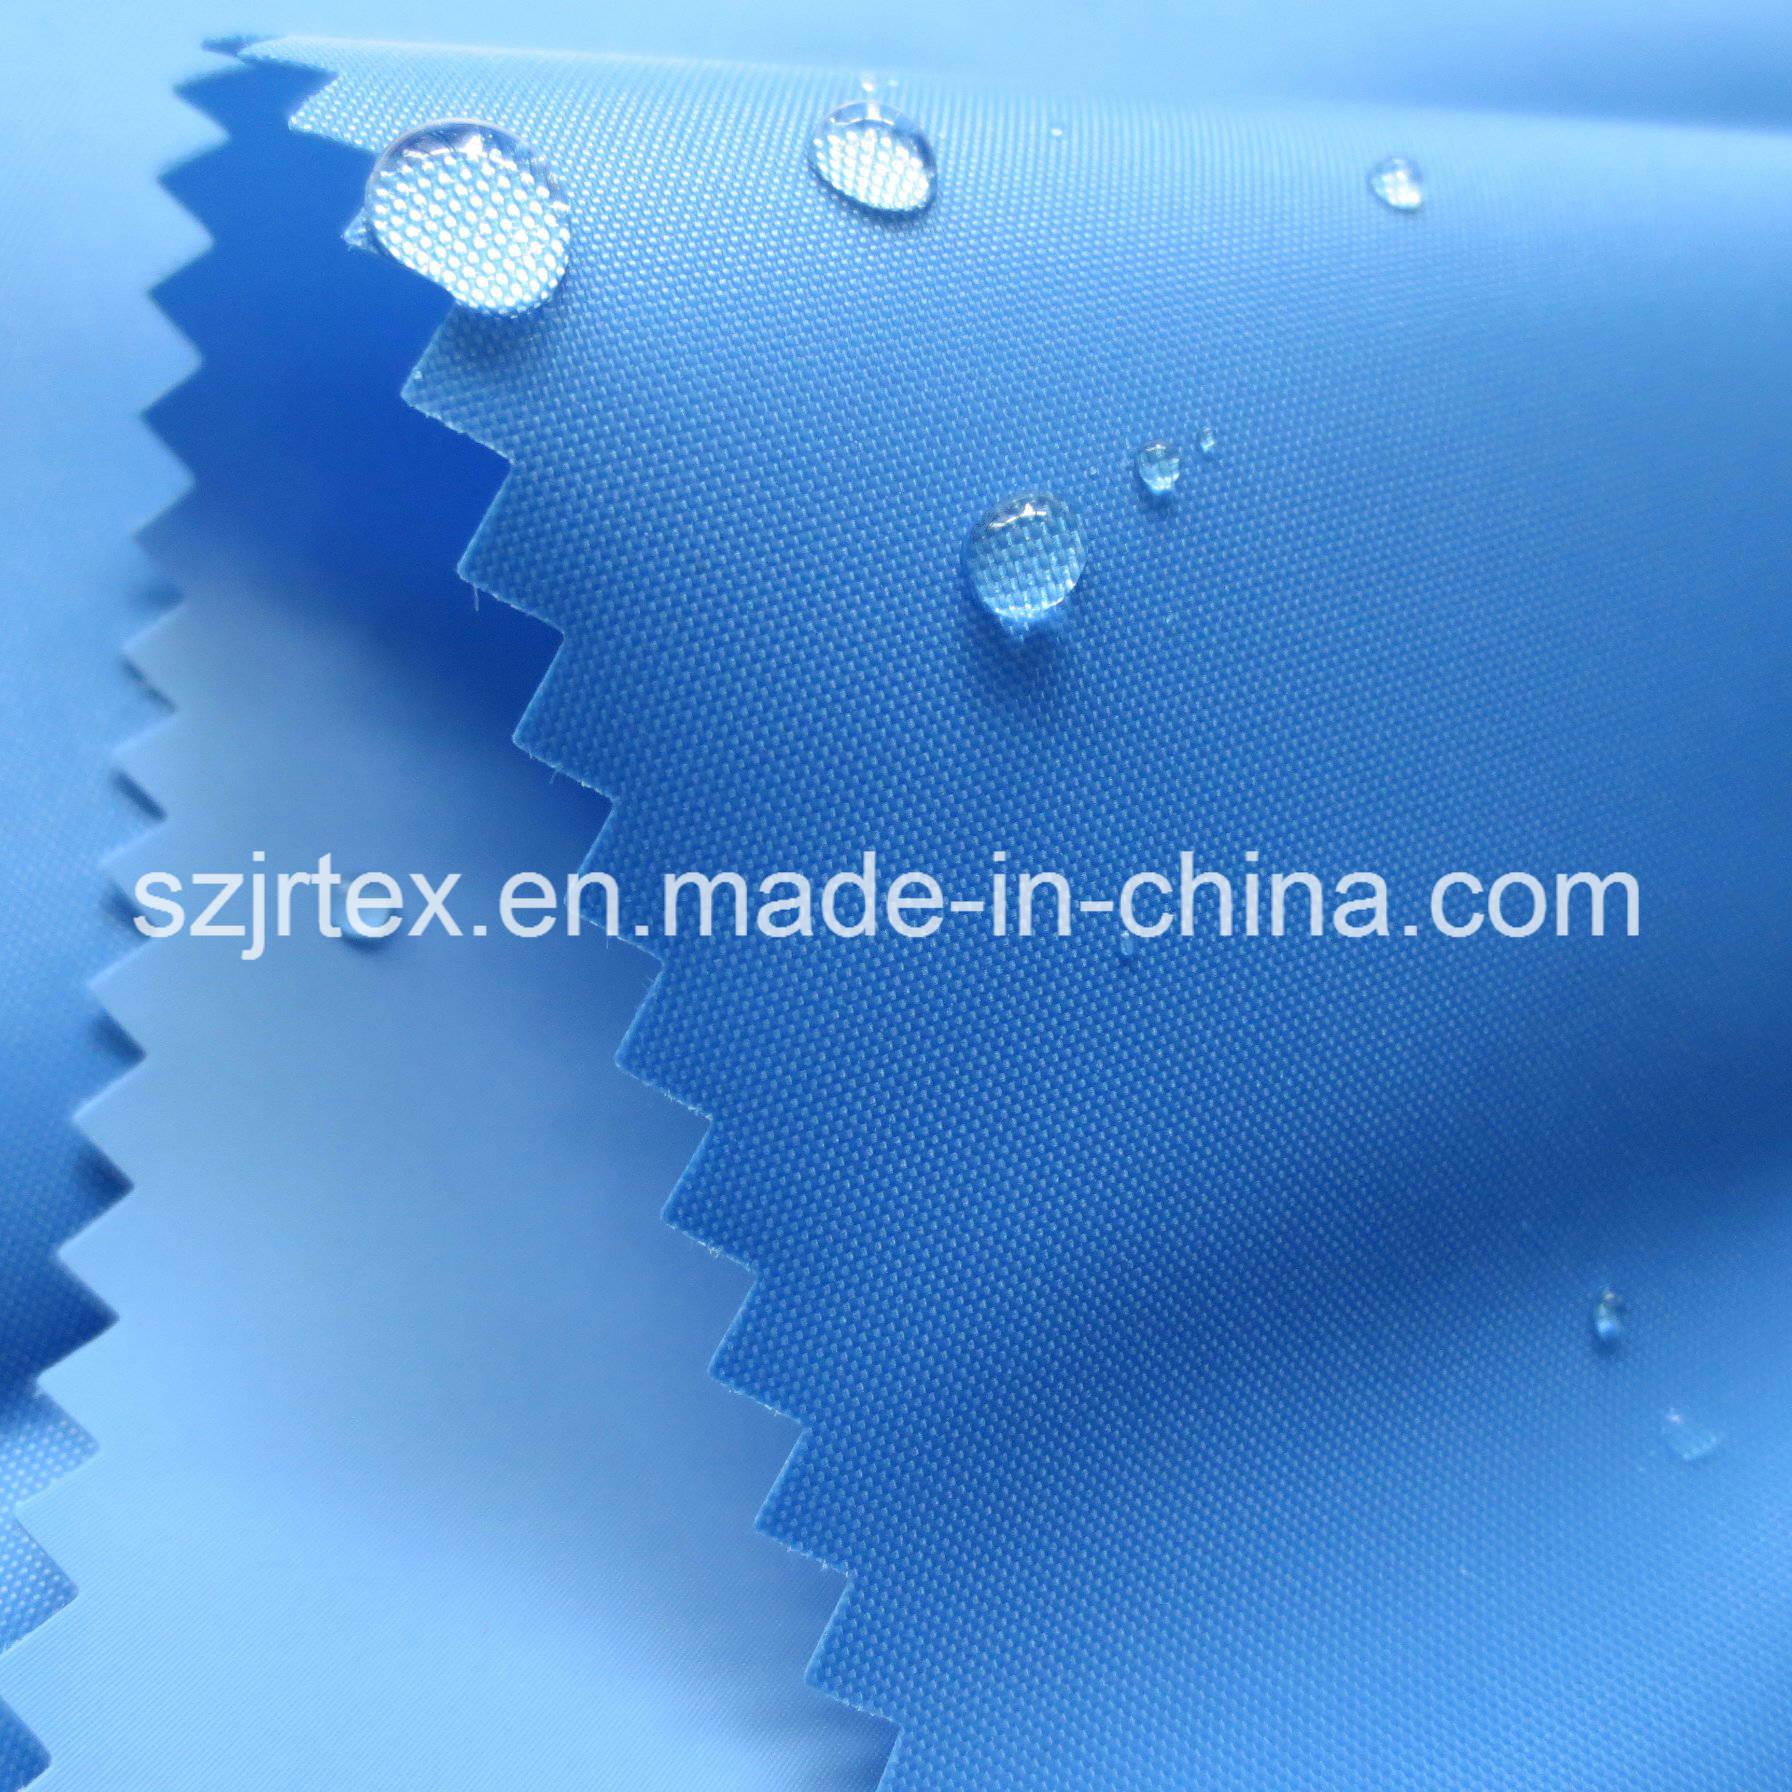 190t Nylon Fabric with Coating Waterproof for Raincoat